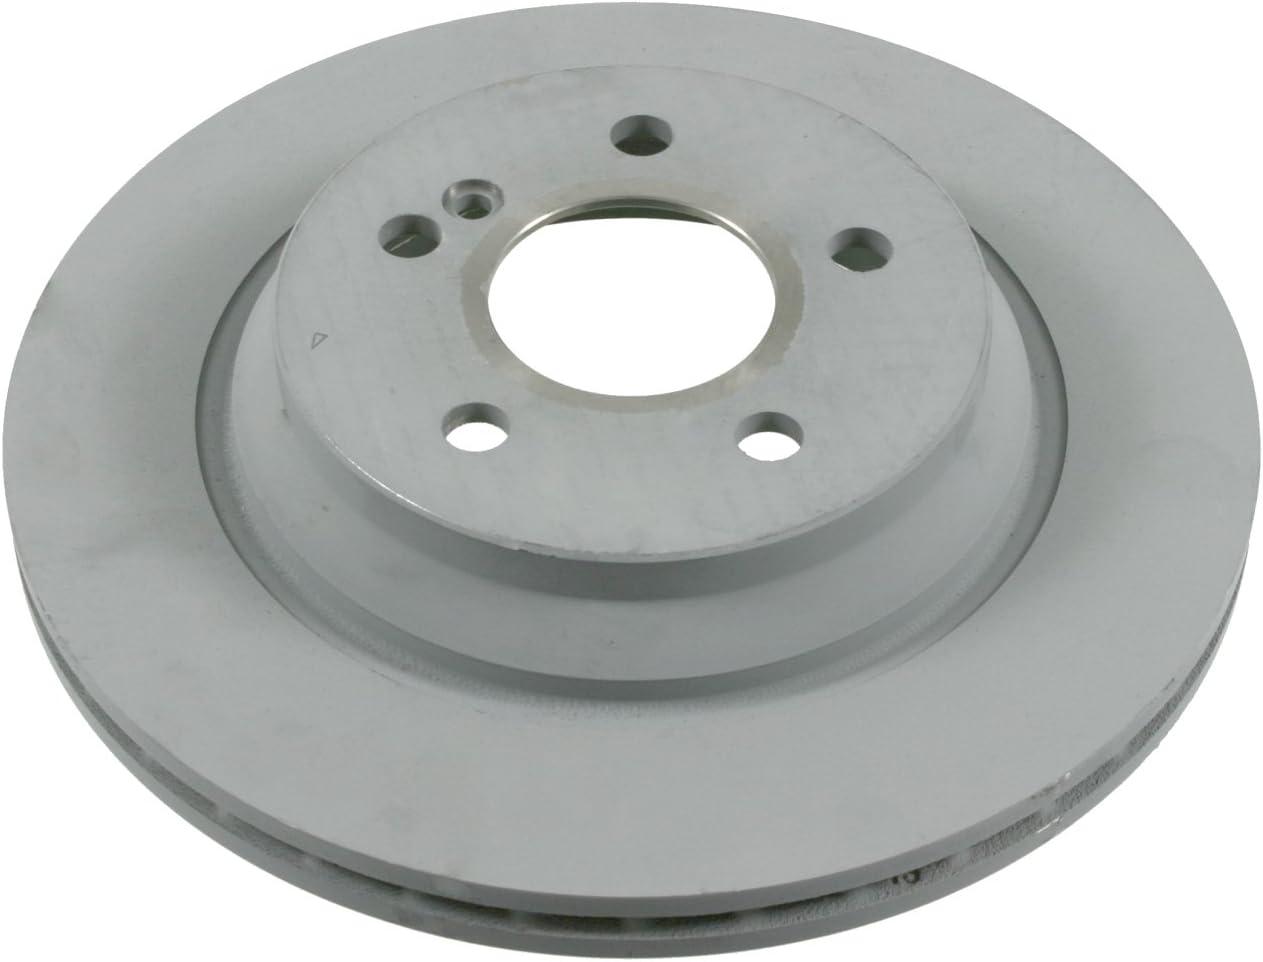 2 Brake Disc febi bilstein 26108 Brake Disc Set No internally ventilated of Holes 5 rear